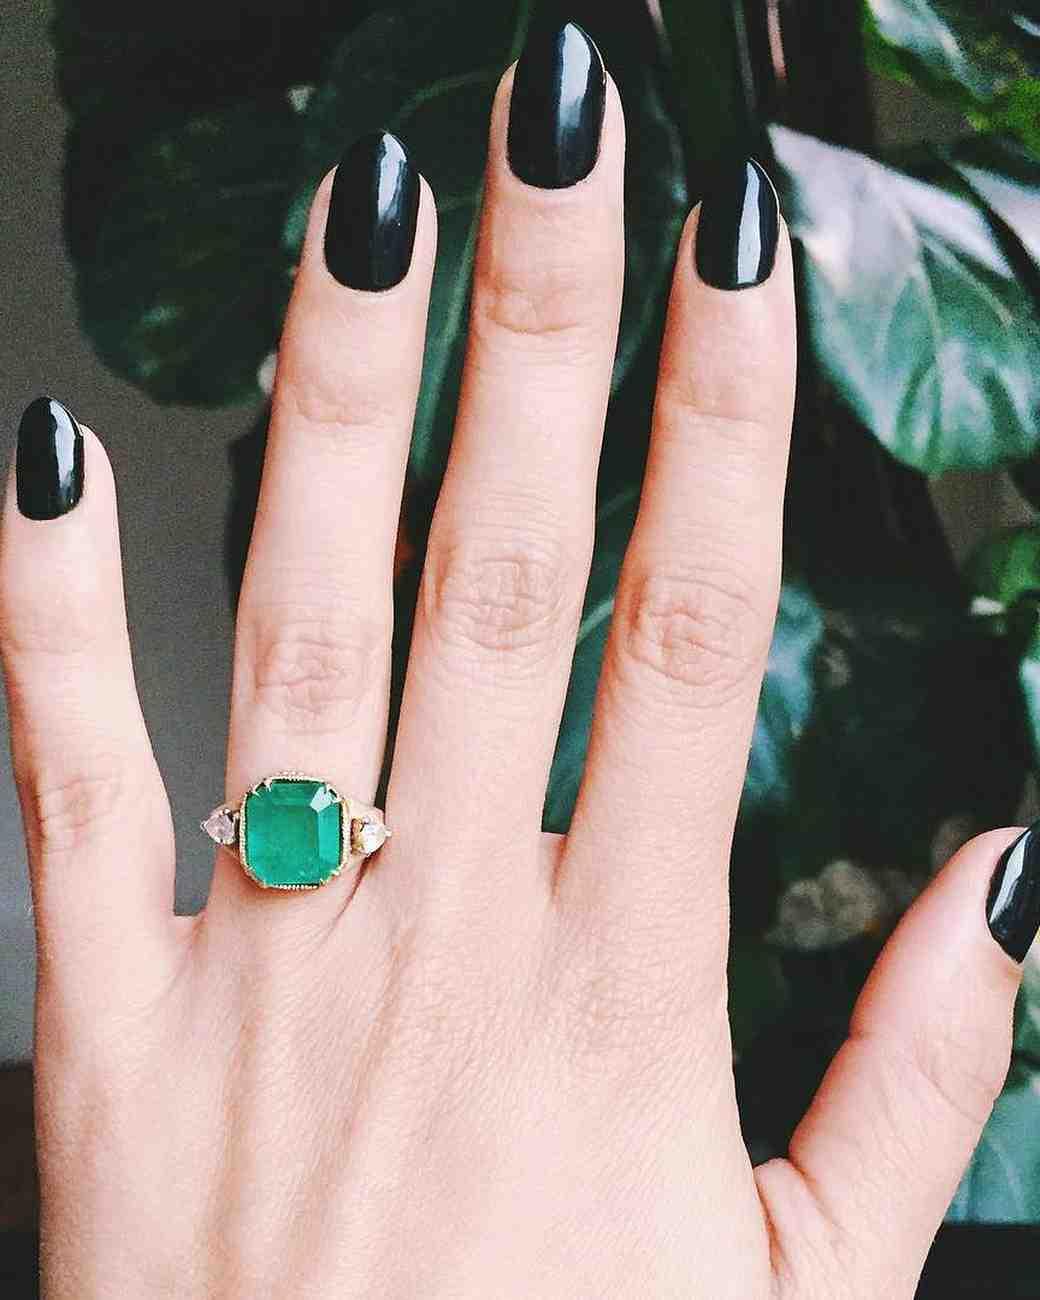 engagement-ring-selfies-emerald-ring-and-nails-0216.jpg